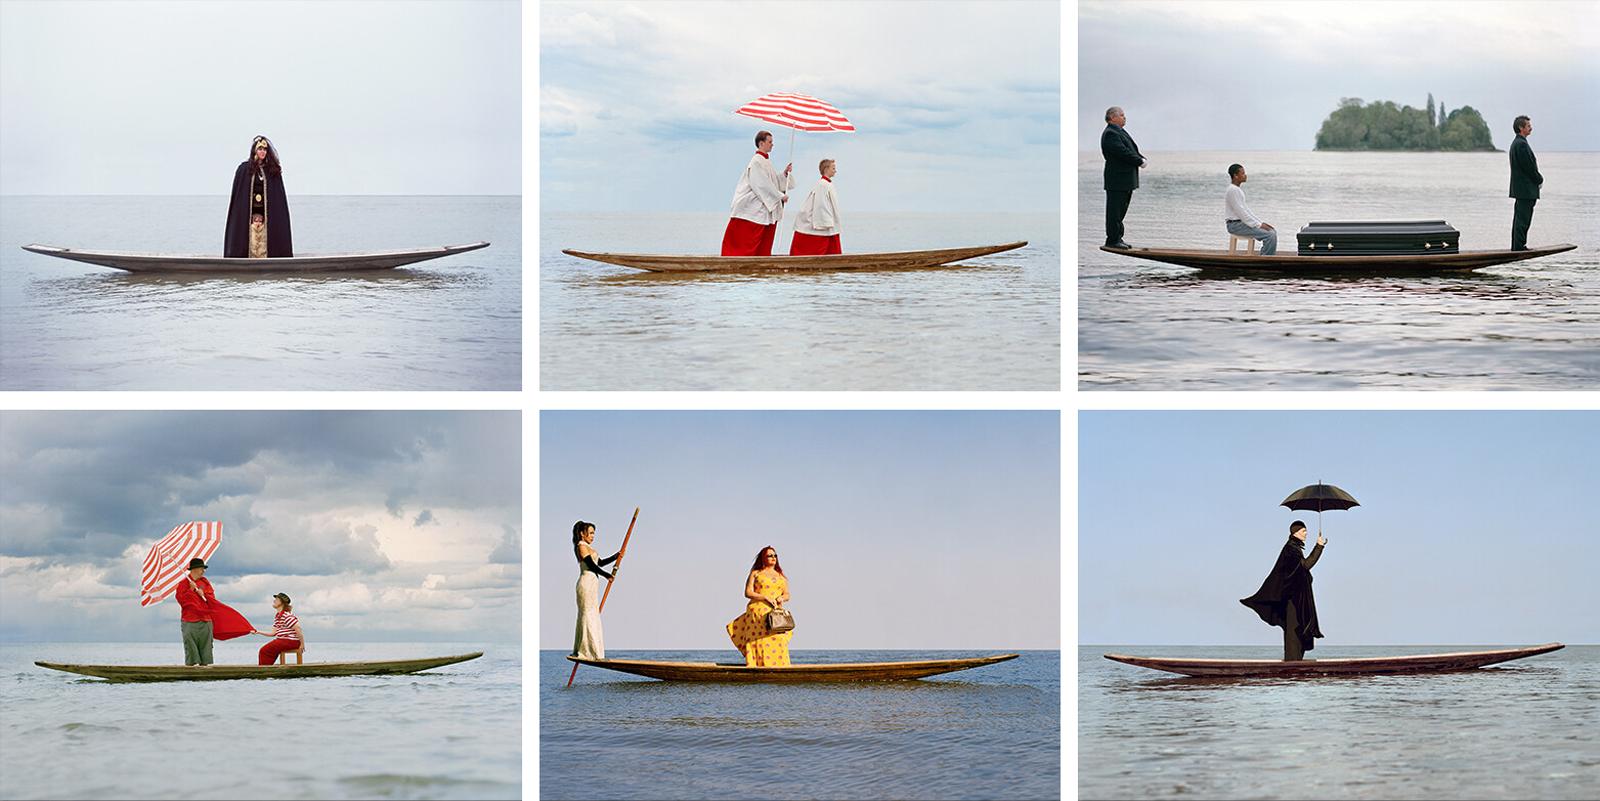 Boat No. III - Bettina Flitner